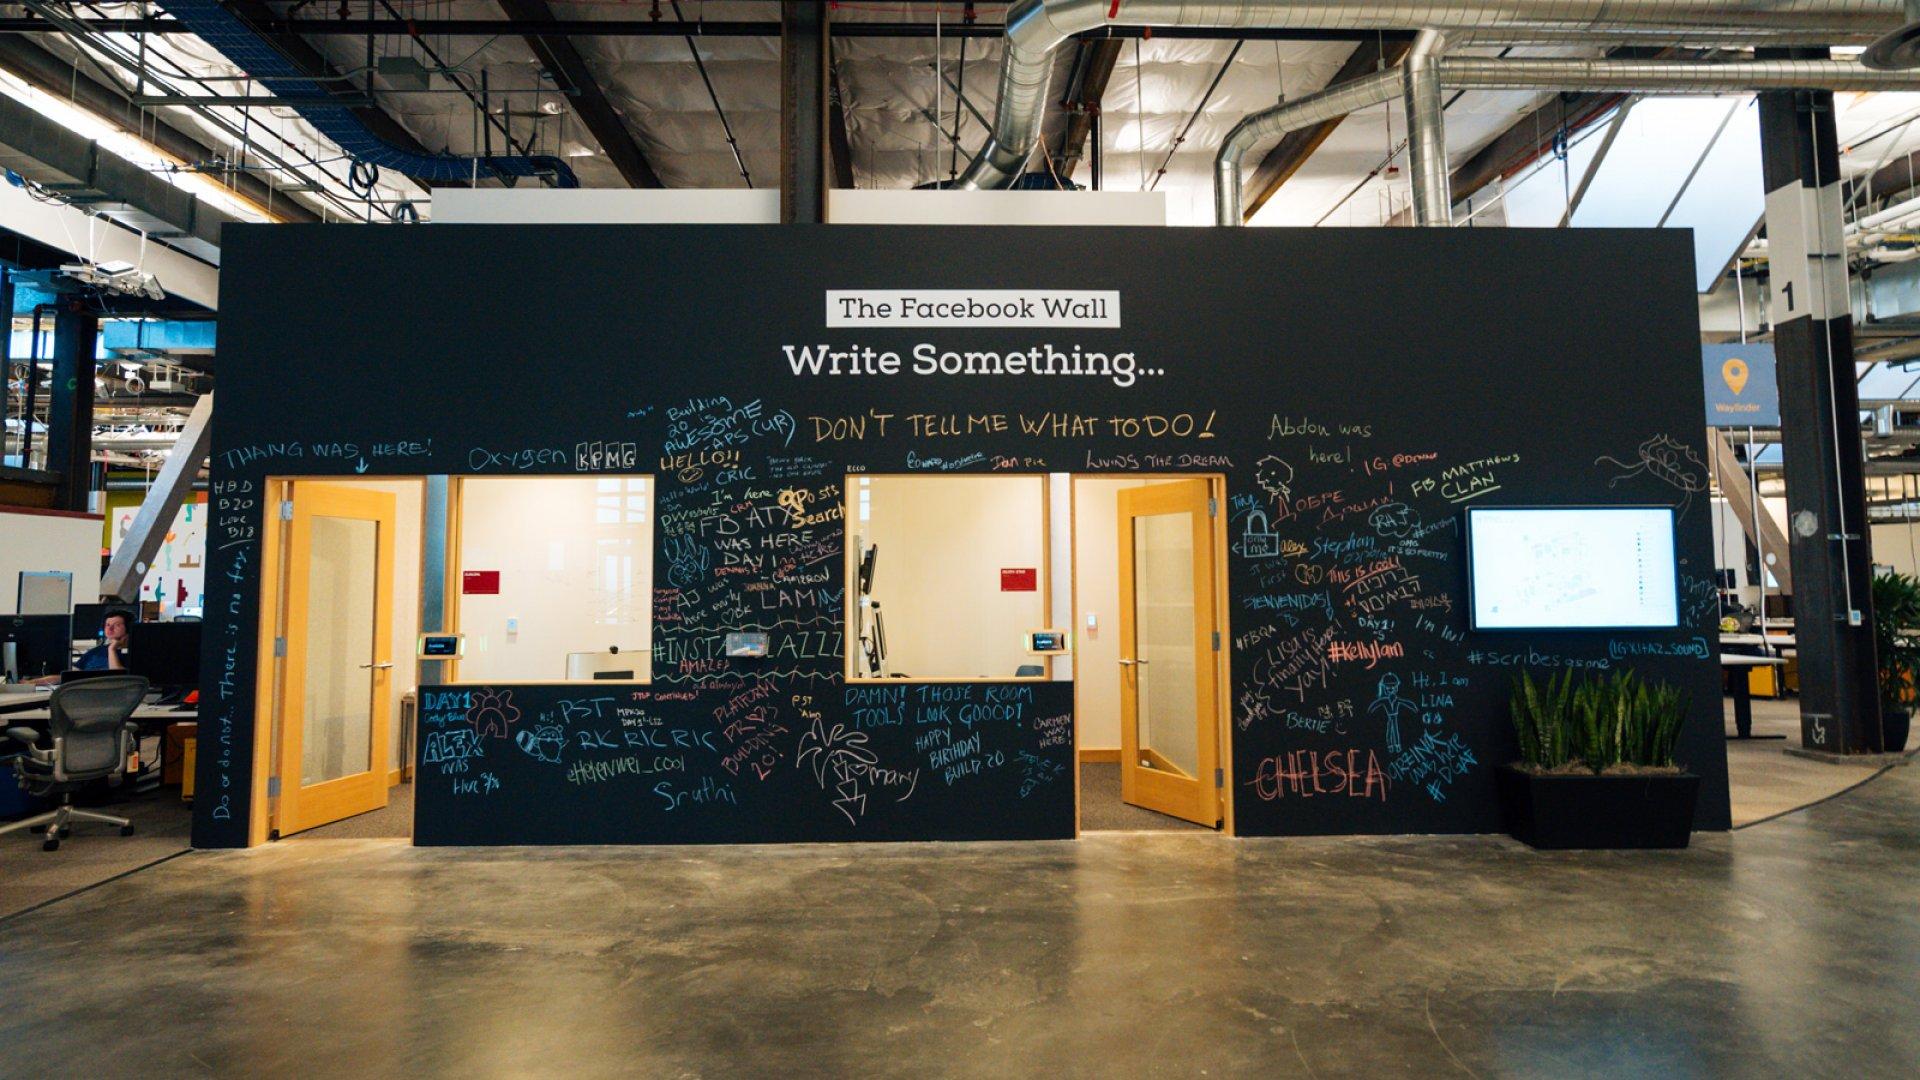 A message wall greets visitors at Facebook HQ.